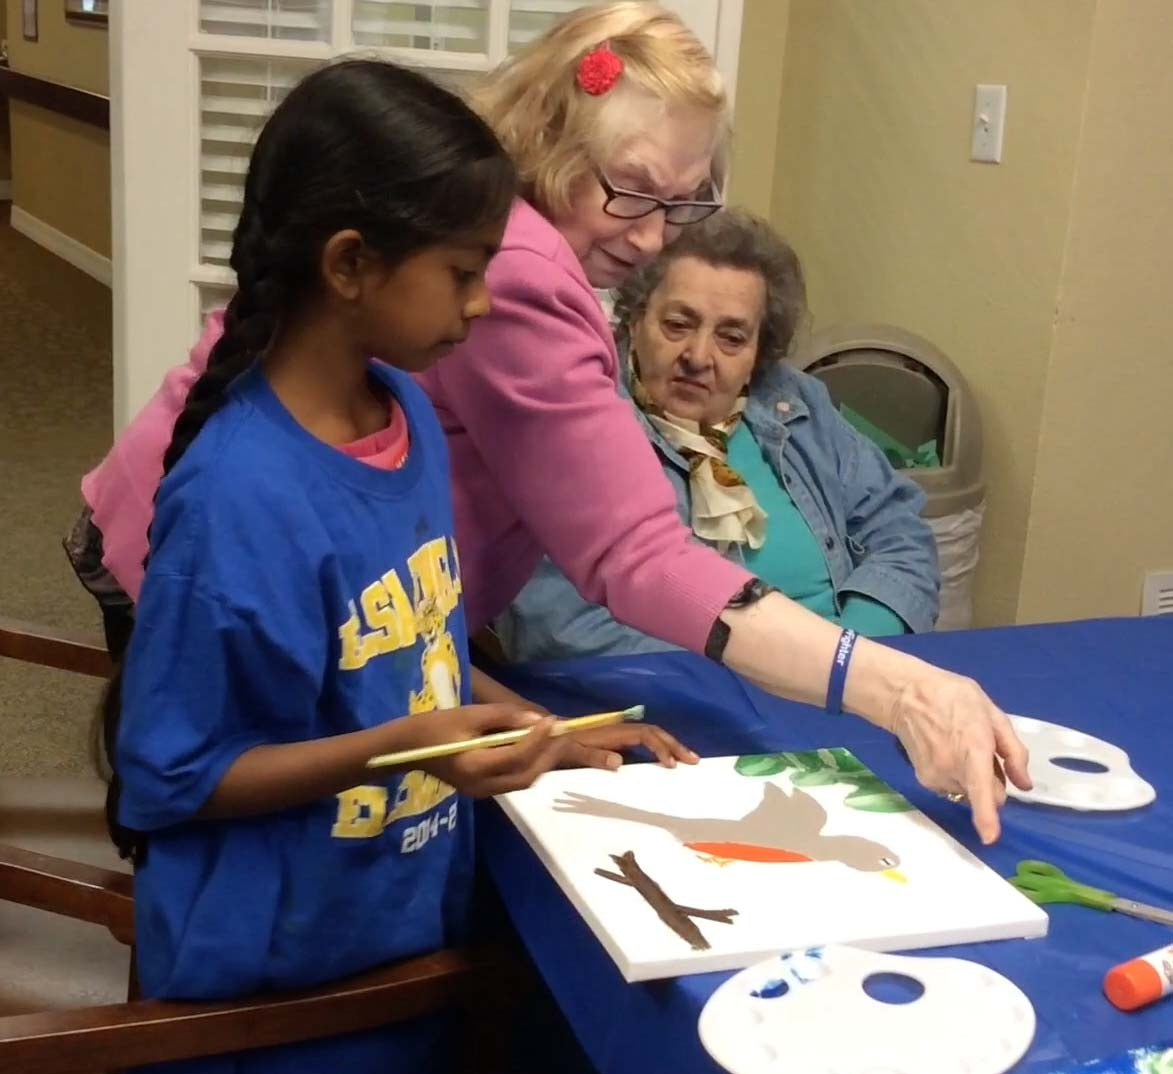 England Ageless Art program teaches students and elderly alike